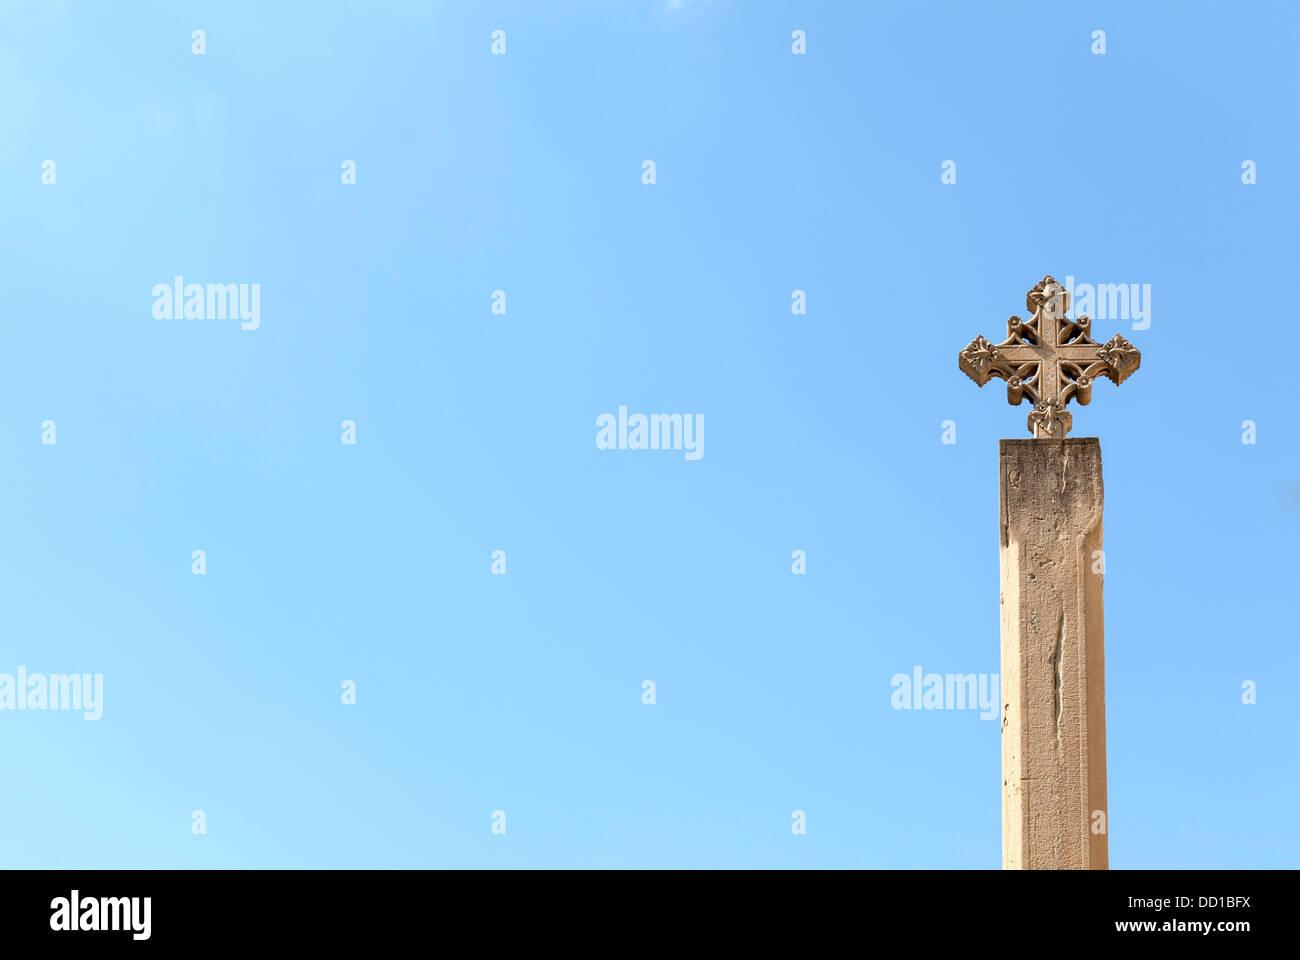 Puig-reig,Catalonia,Spain - Stock Image